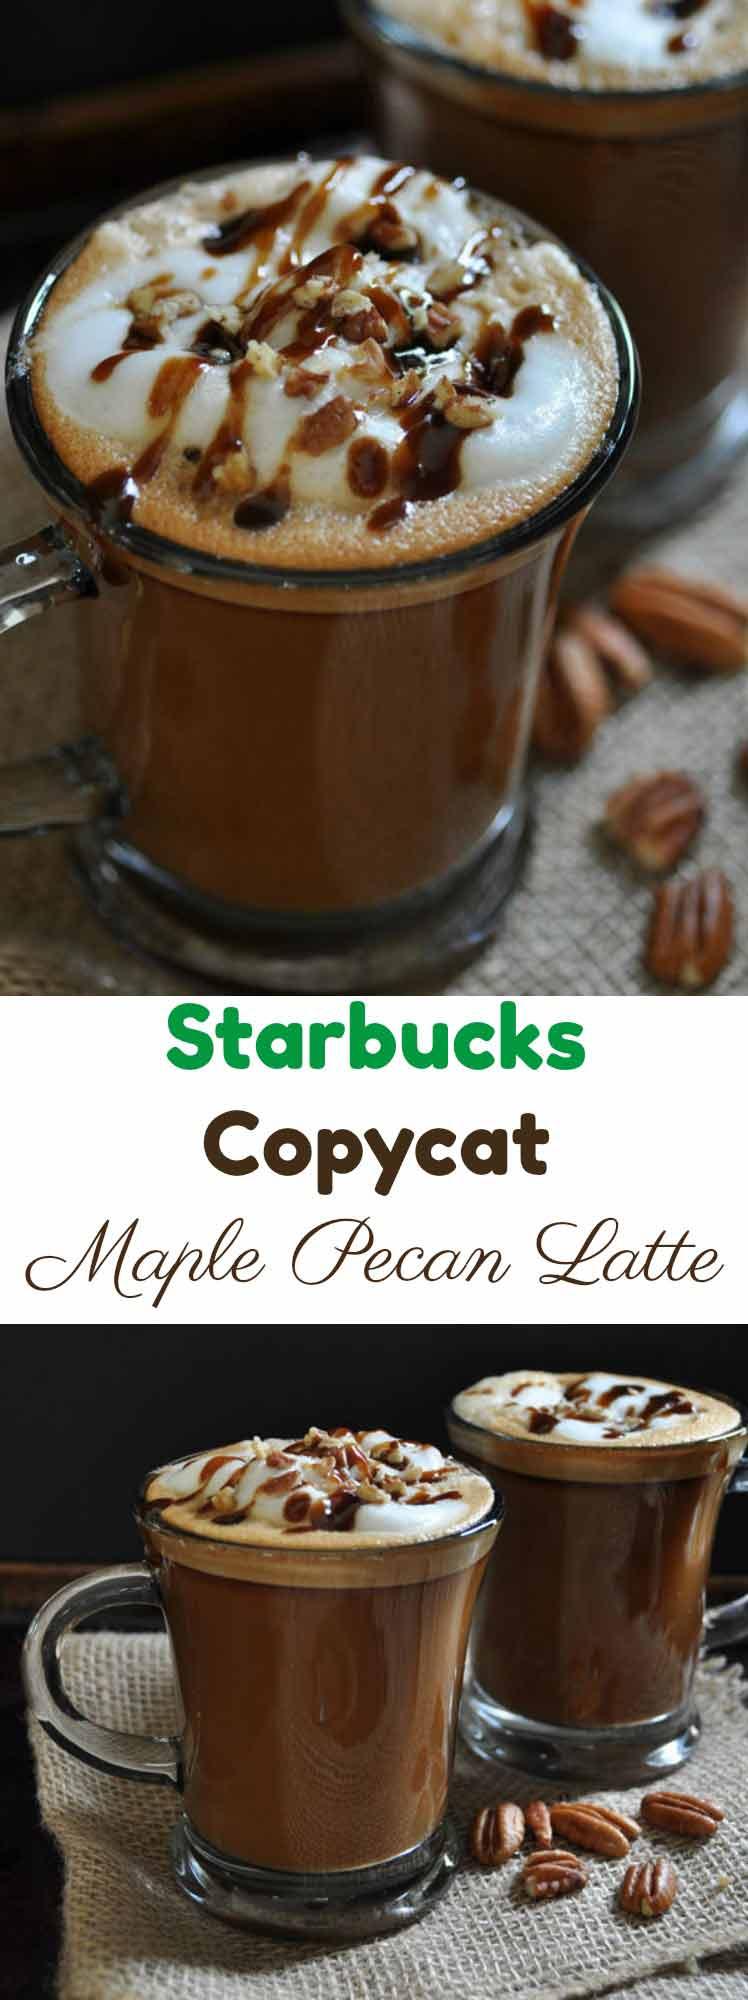 Starbucks Copycat Maple Pecan Latte made in your kitchen! Pure pecan extract and plant-based milk make it vegan!